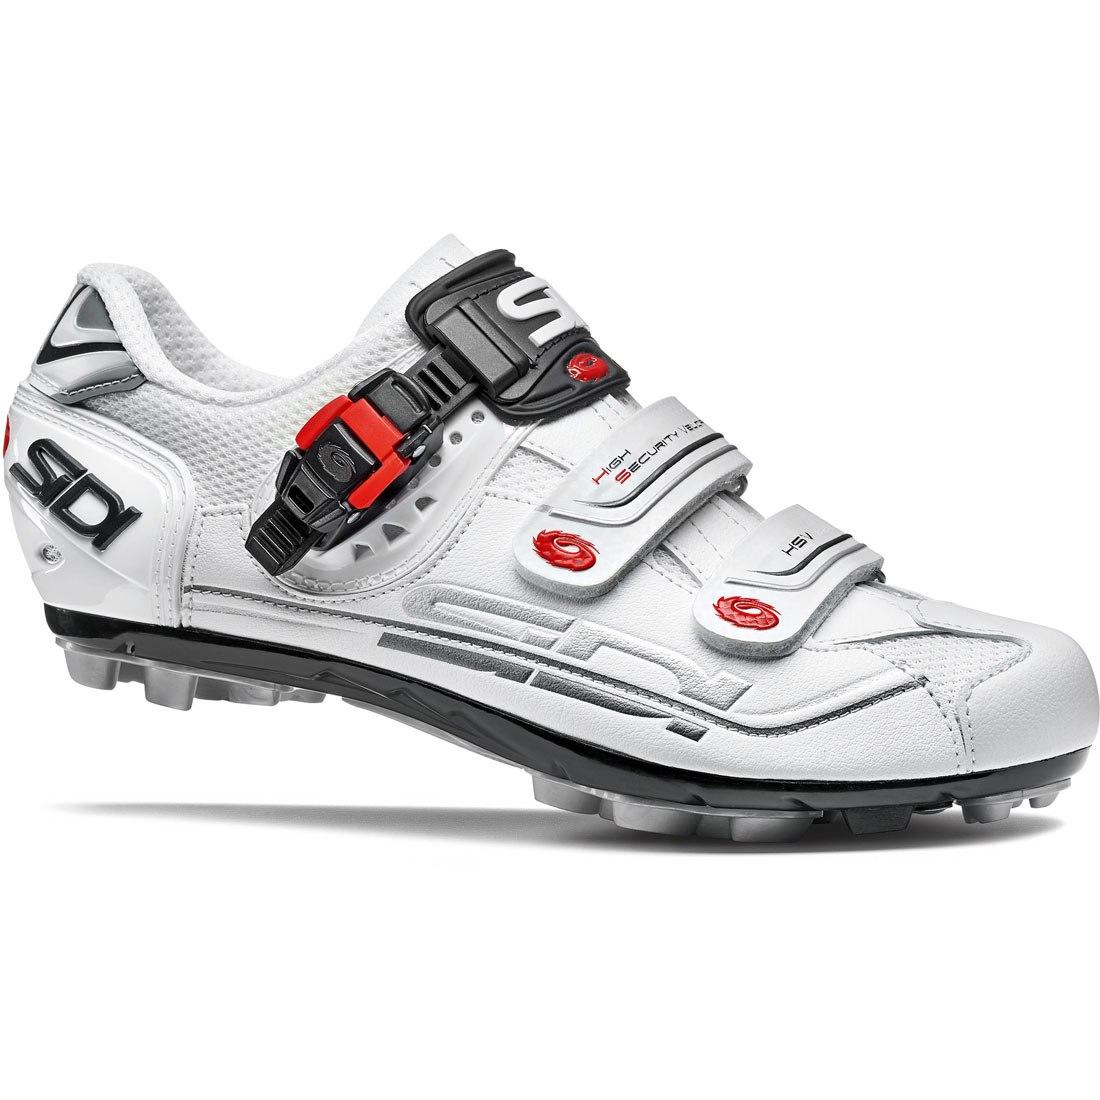 Sidi Eagle 7 MTB Shoe - white/white